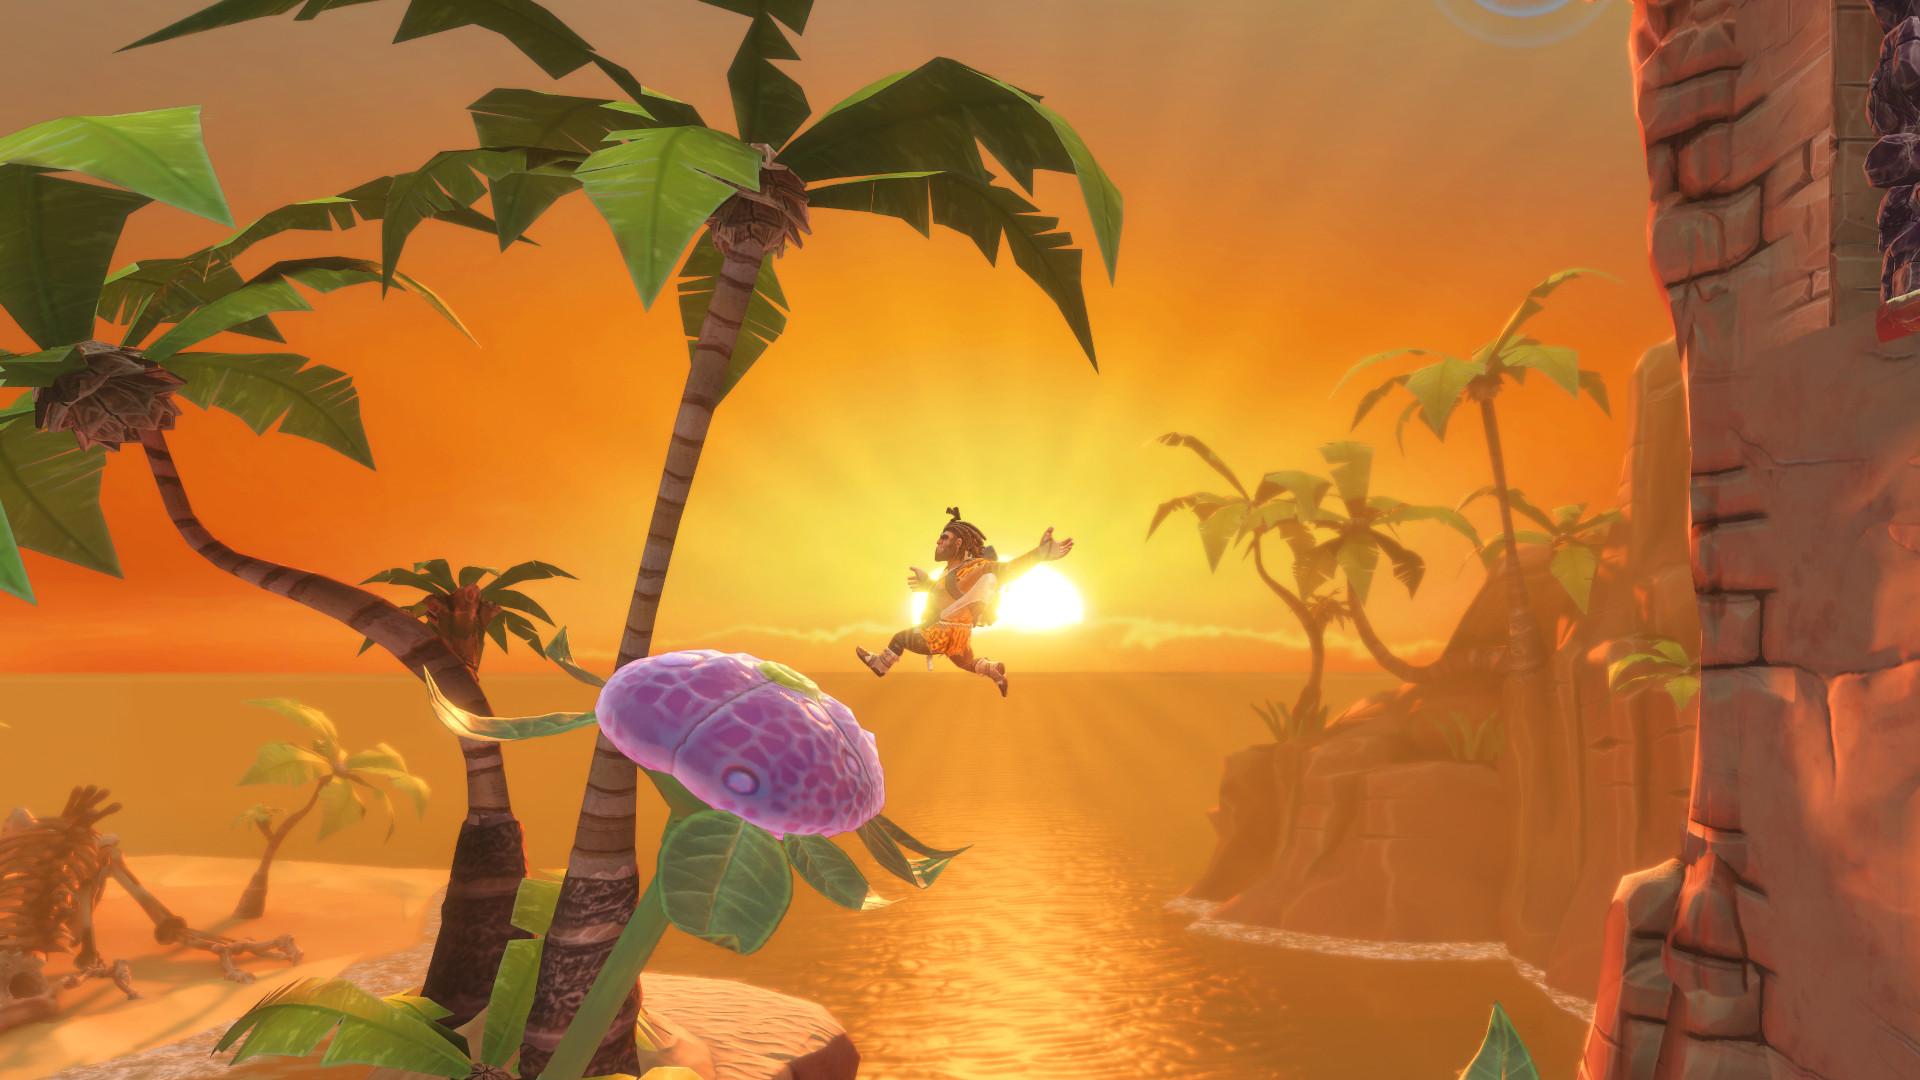 Jet_Kave_Adventure_Screenshot_6.jpg